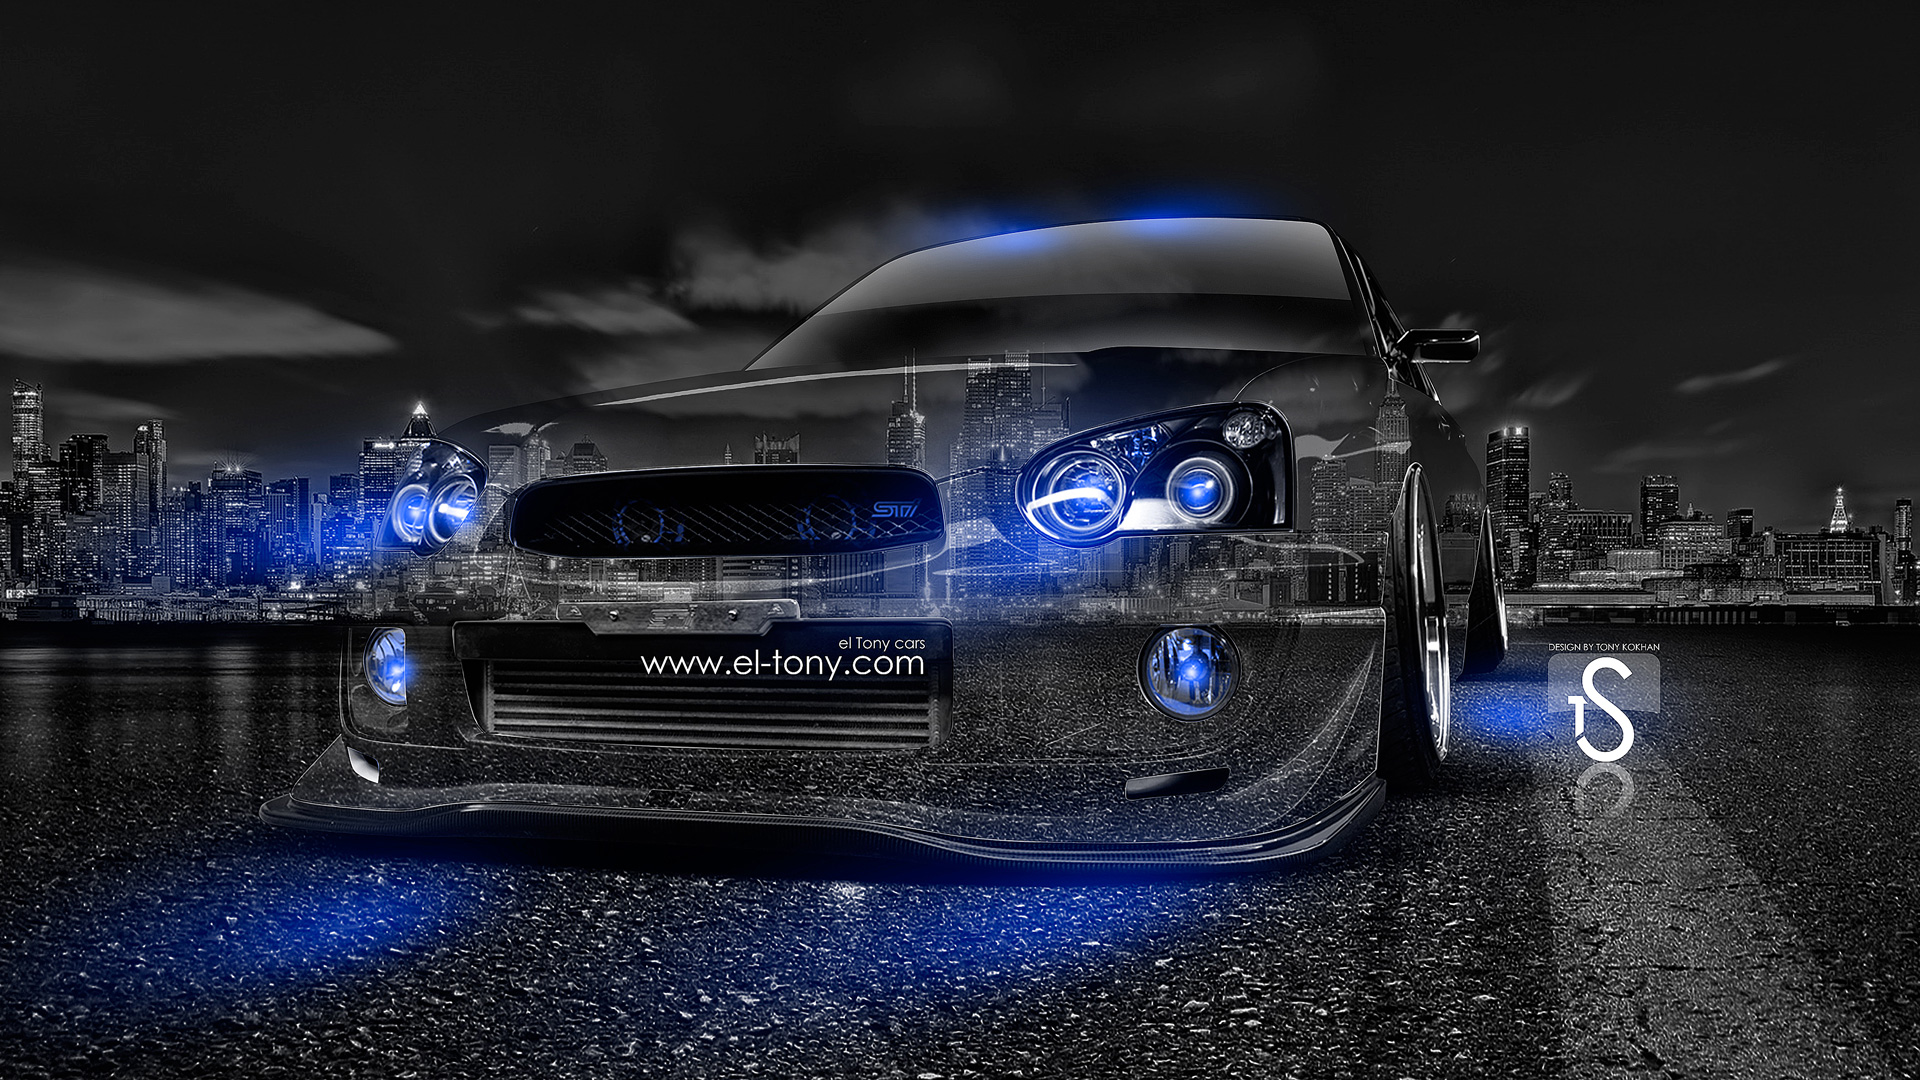 Subaru Wrx Wallpaper Hd Wallpapersafari